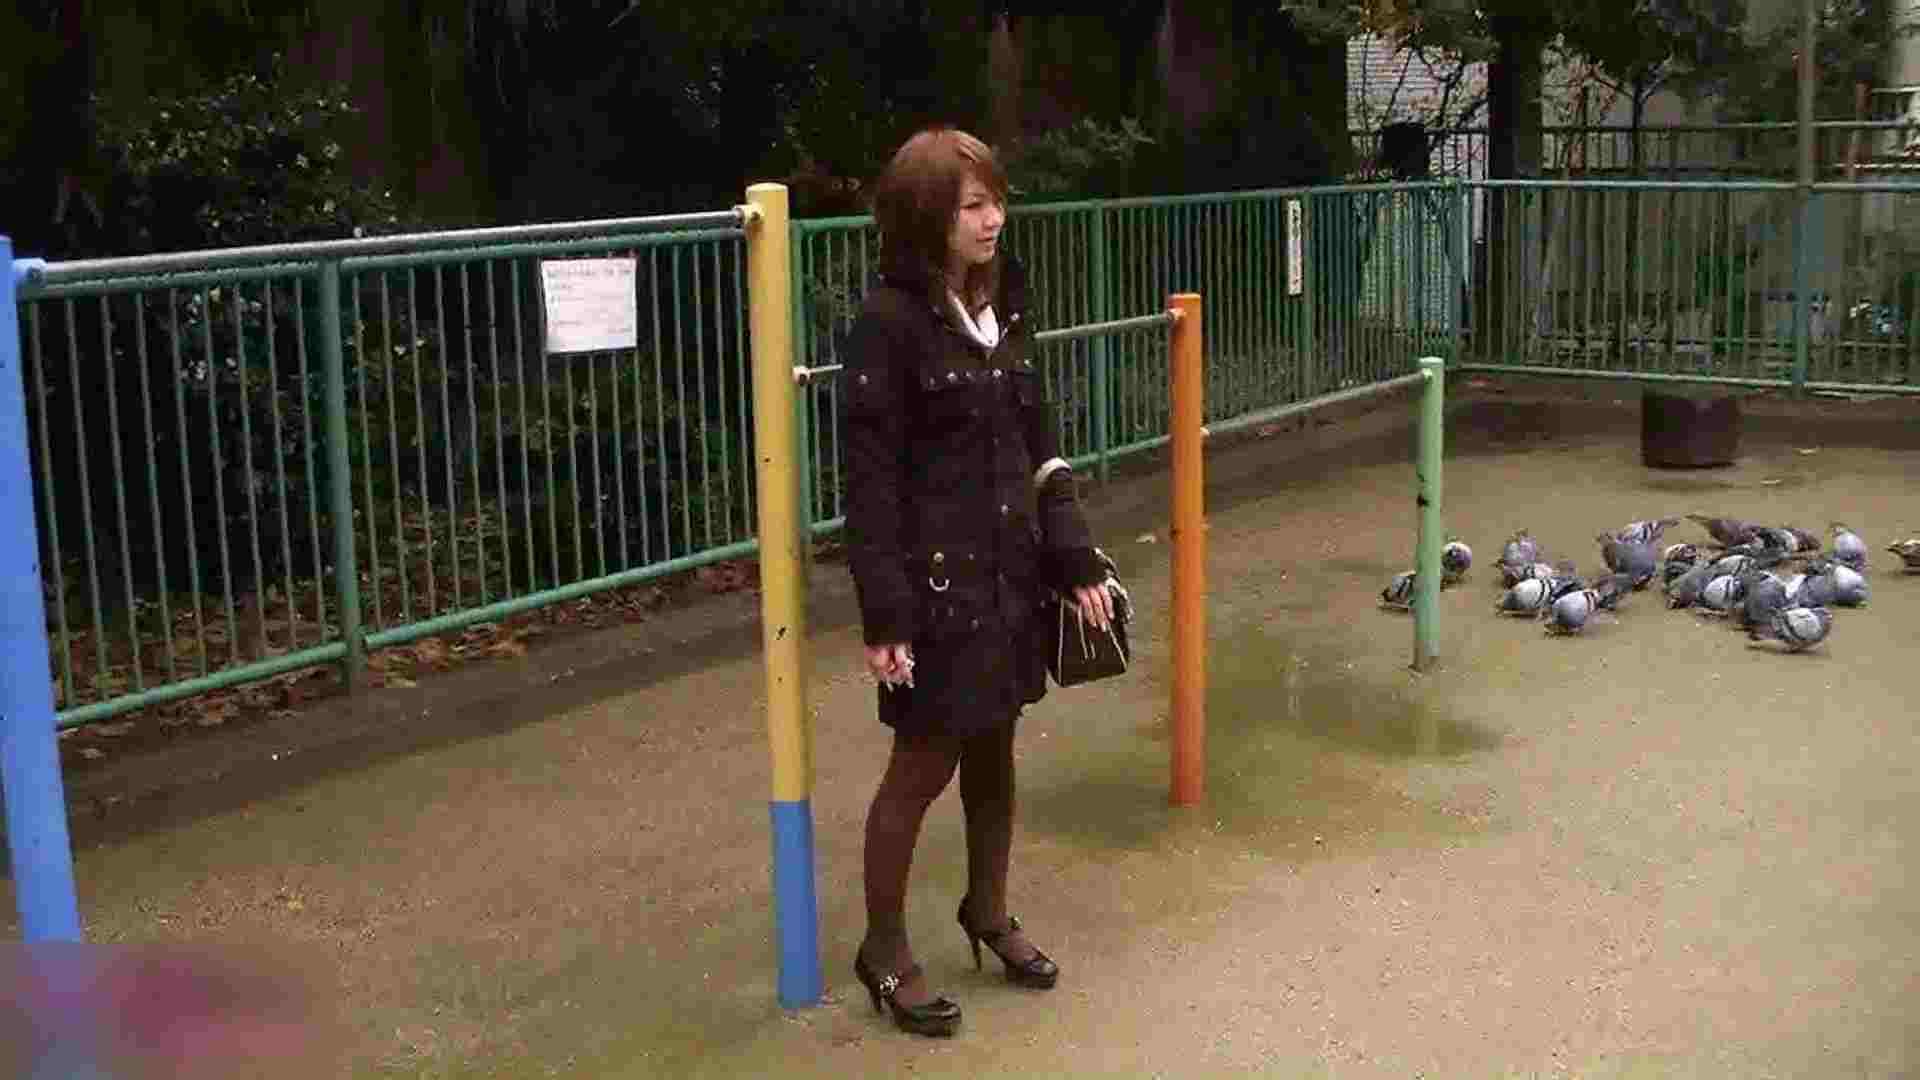 S級厳選美女ビッチガールVol.05 美女OL | 女子大生特集  89連発 1